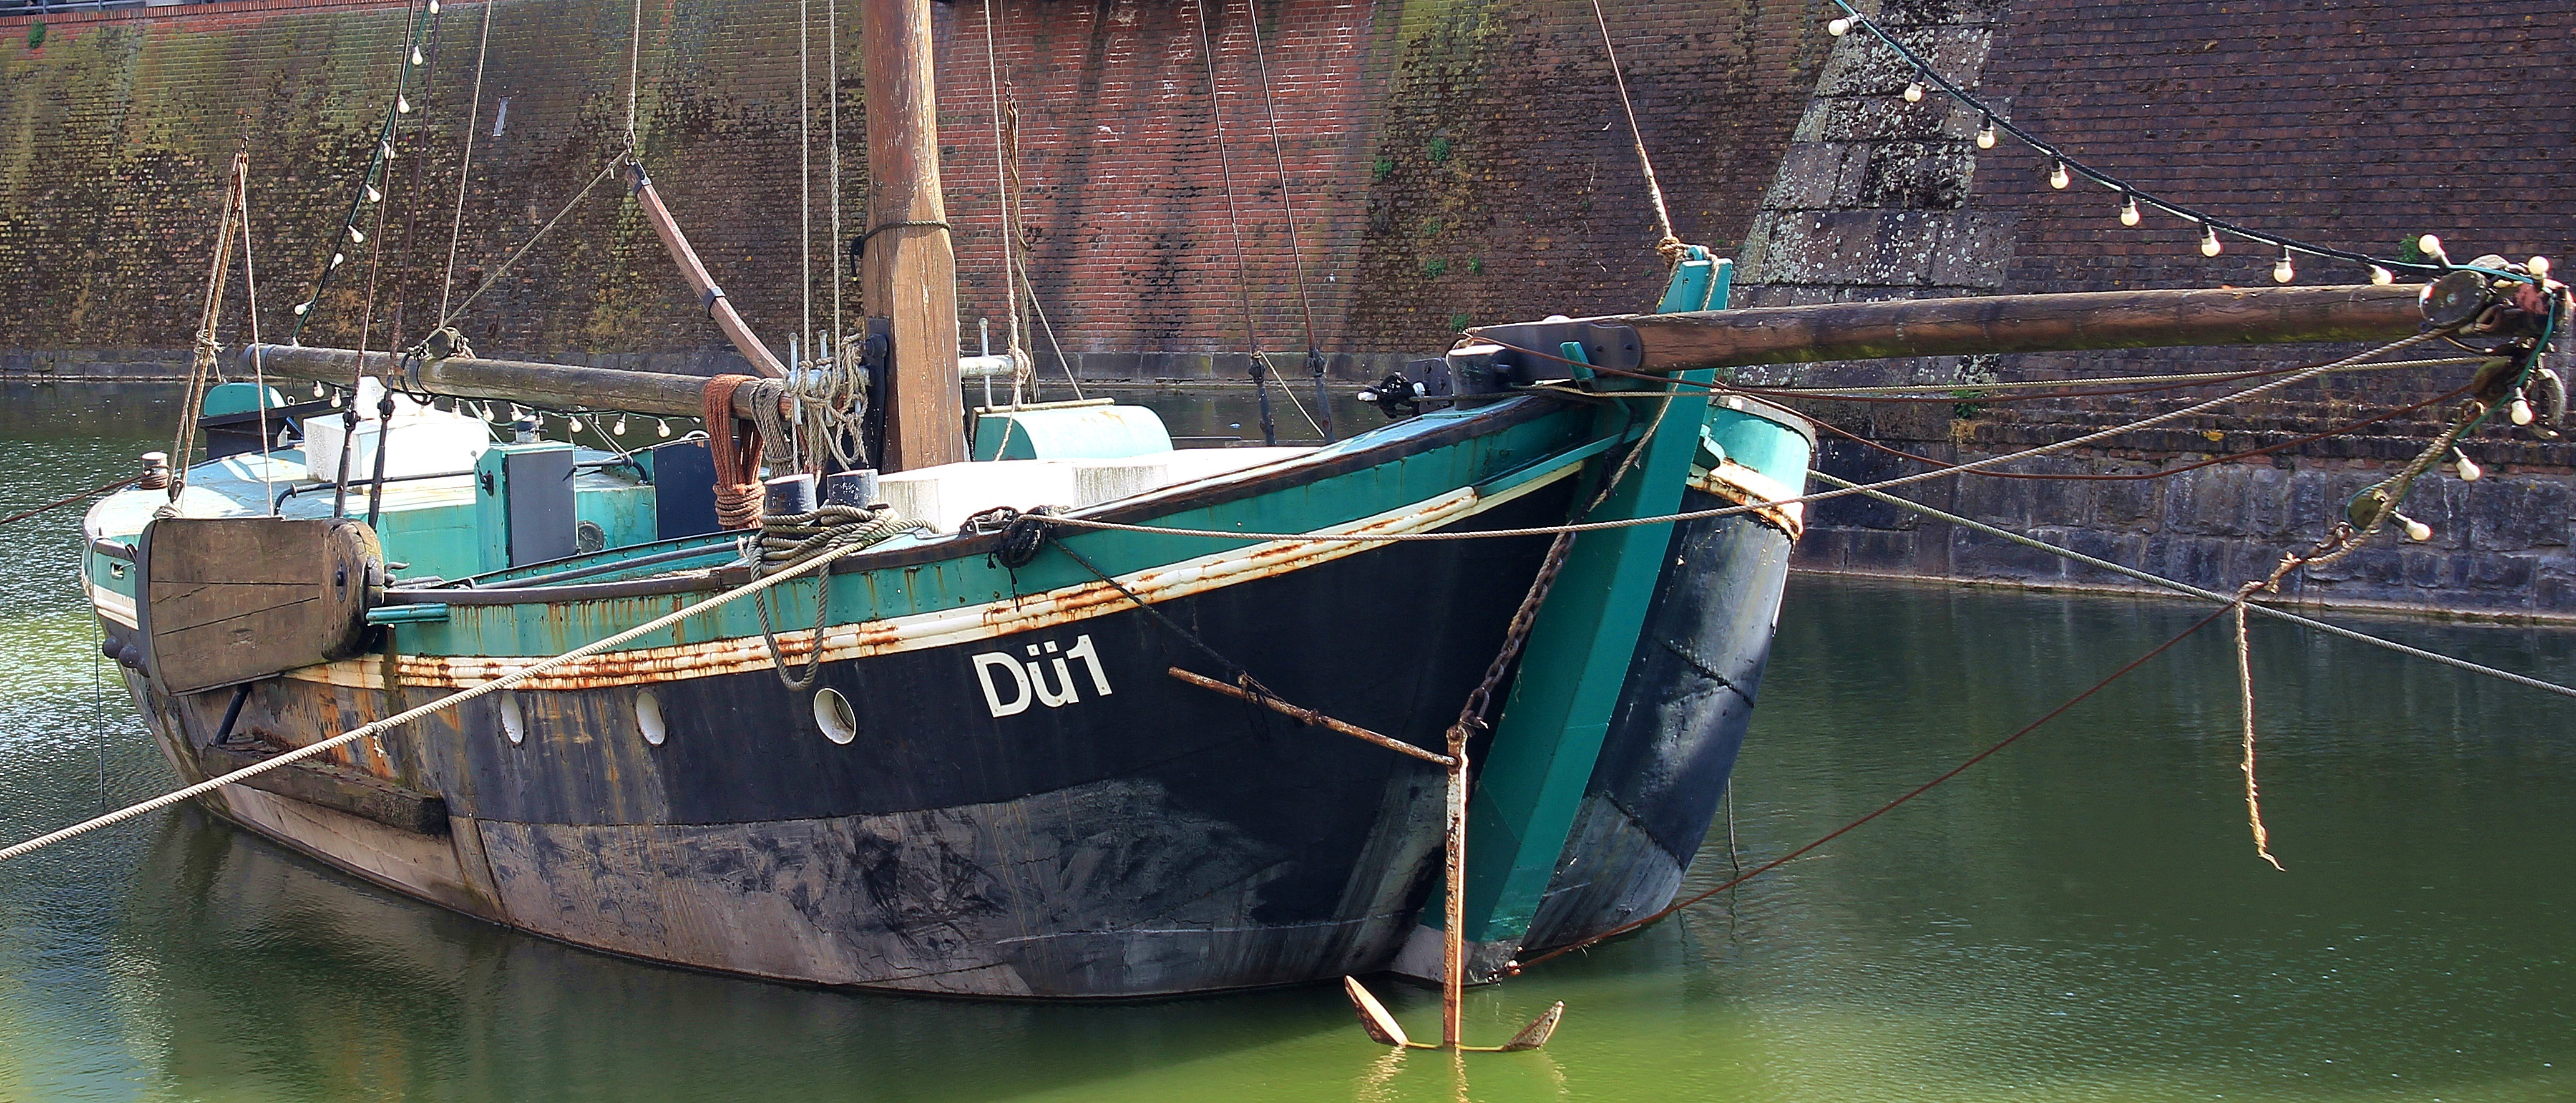 Boat on the Port, Boat, Dusseldorf, Port, River, HQ Photo